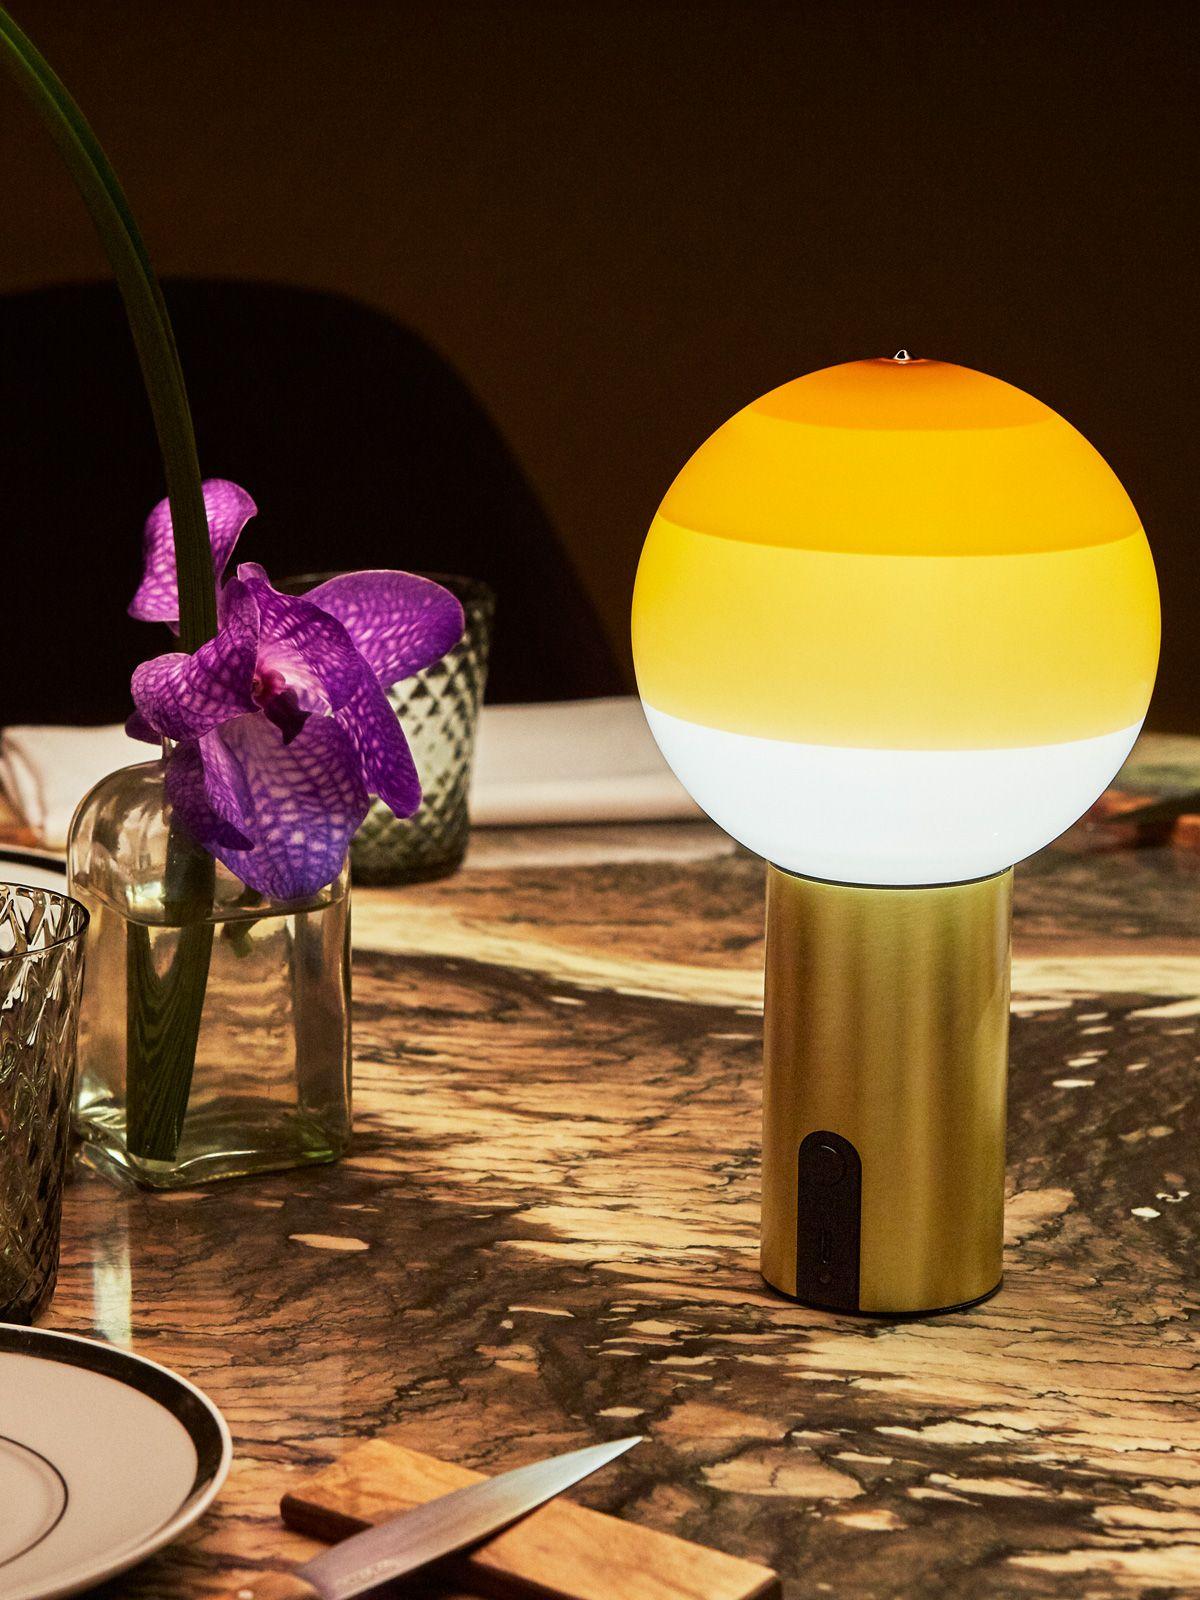 Tragbare Lampen Mit Akku Designort Com Lampen Lampe Glasleuchten